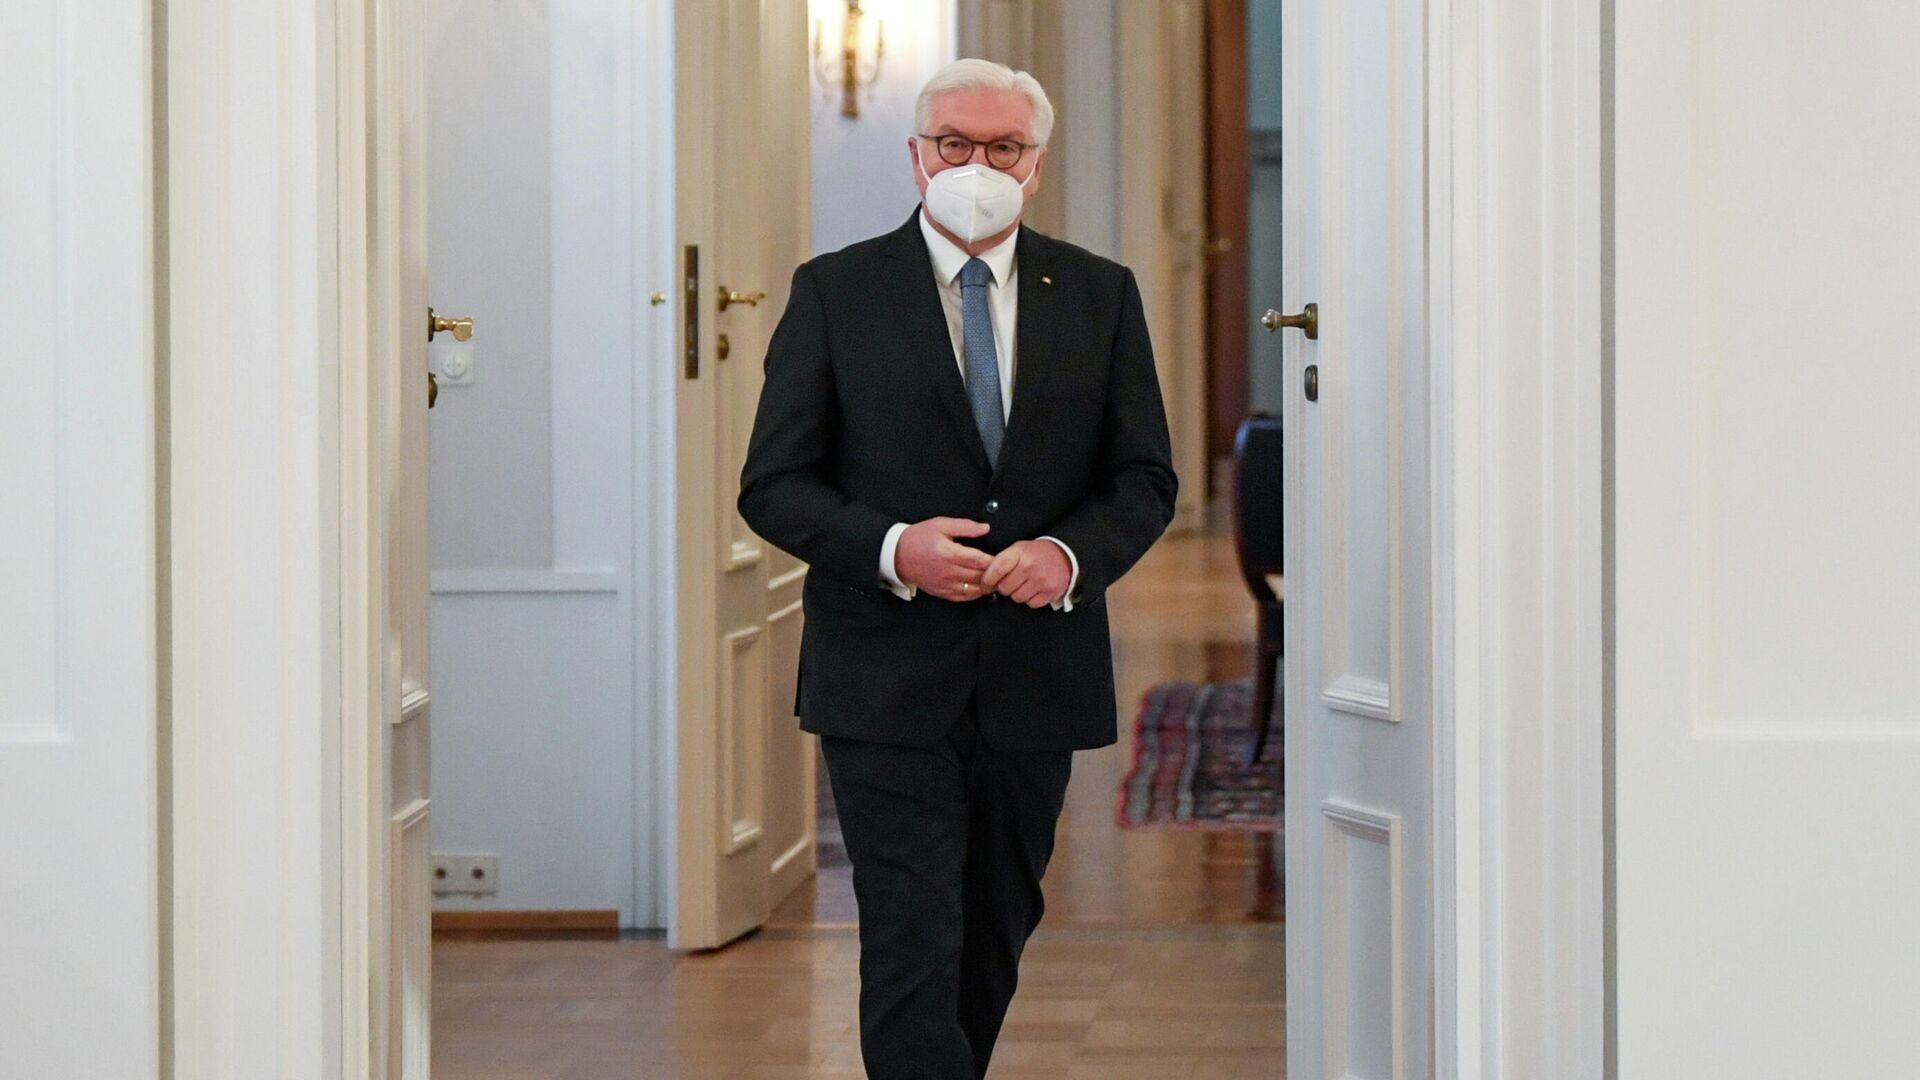 Bundespräsident Frank-Walter Steinmeier im Bellevue-Palast in Berlin, 7. Januar 2021 - SNA, 1920, 22.01.2021